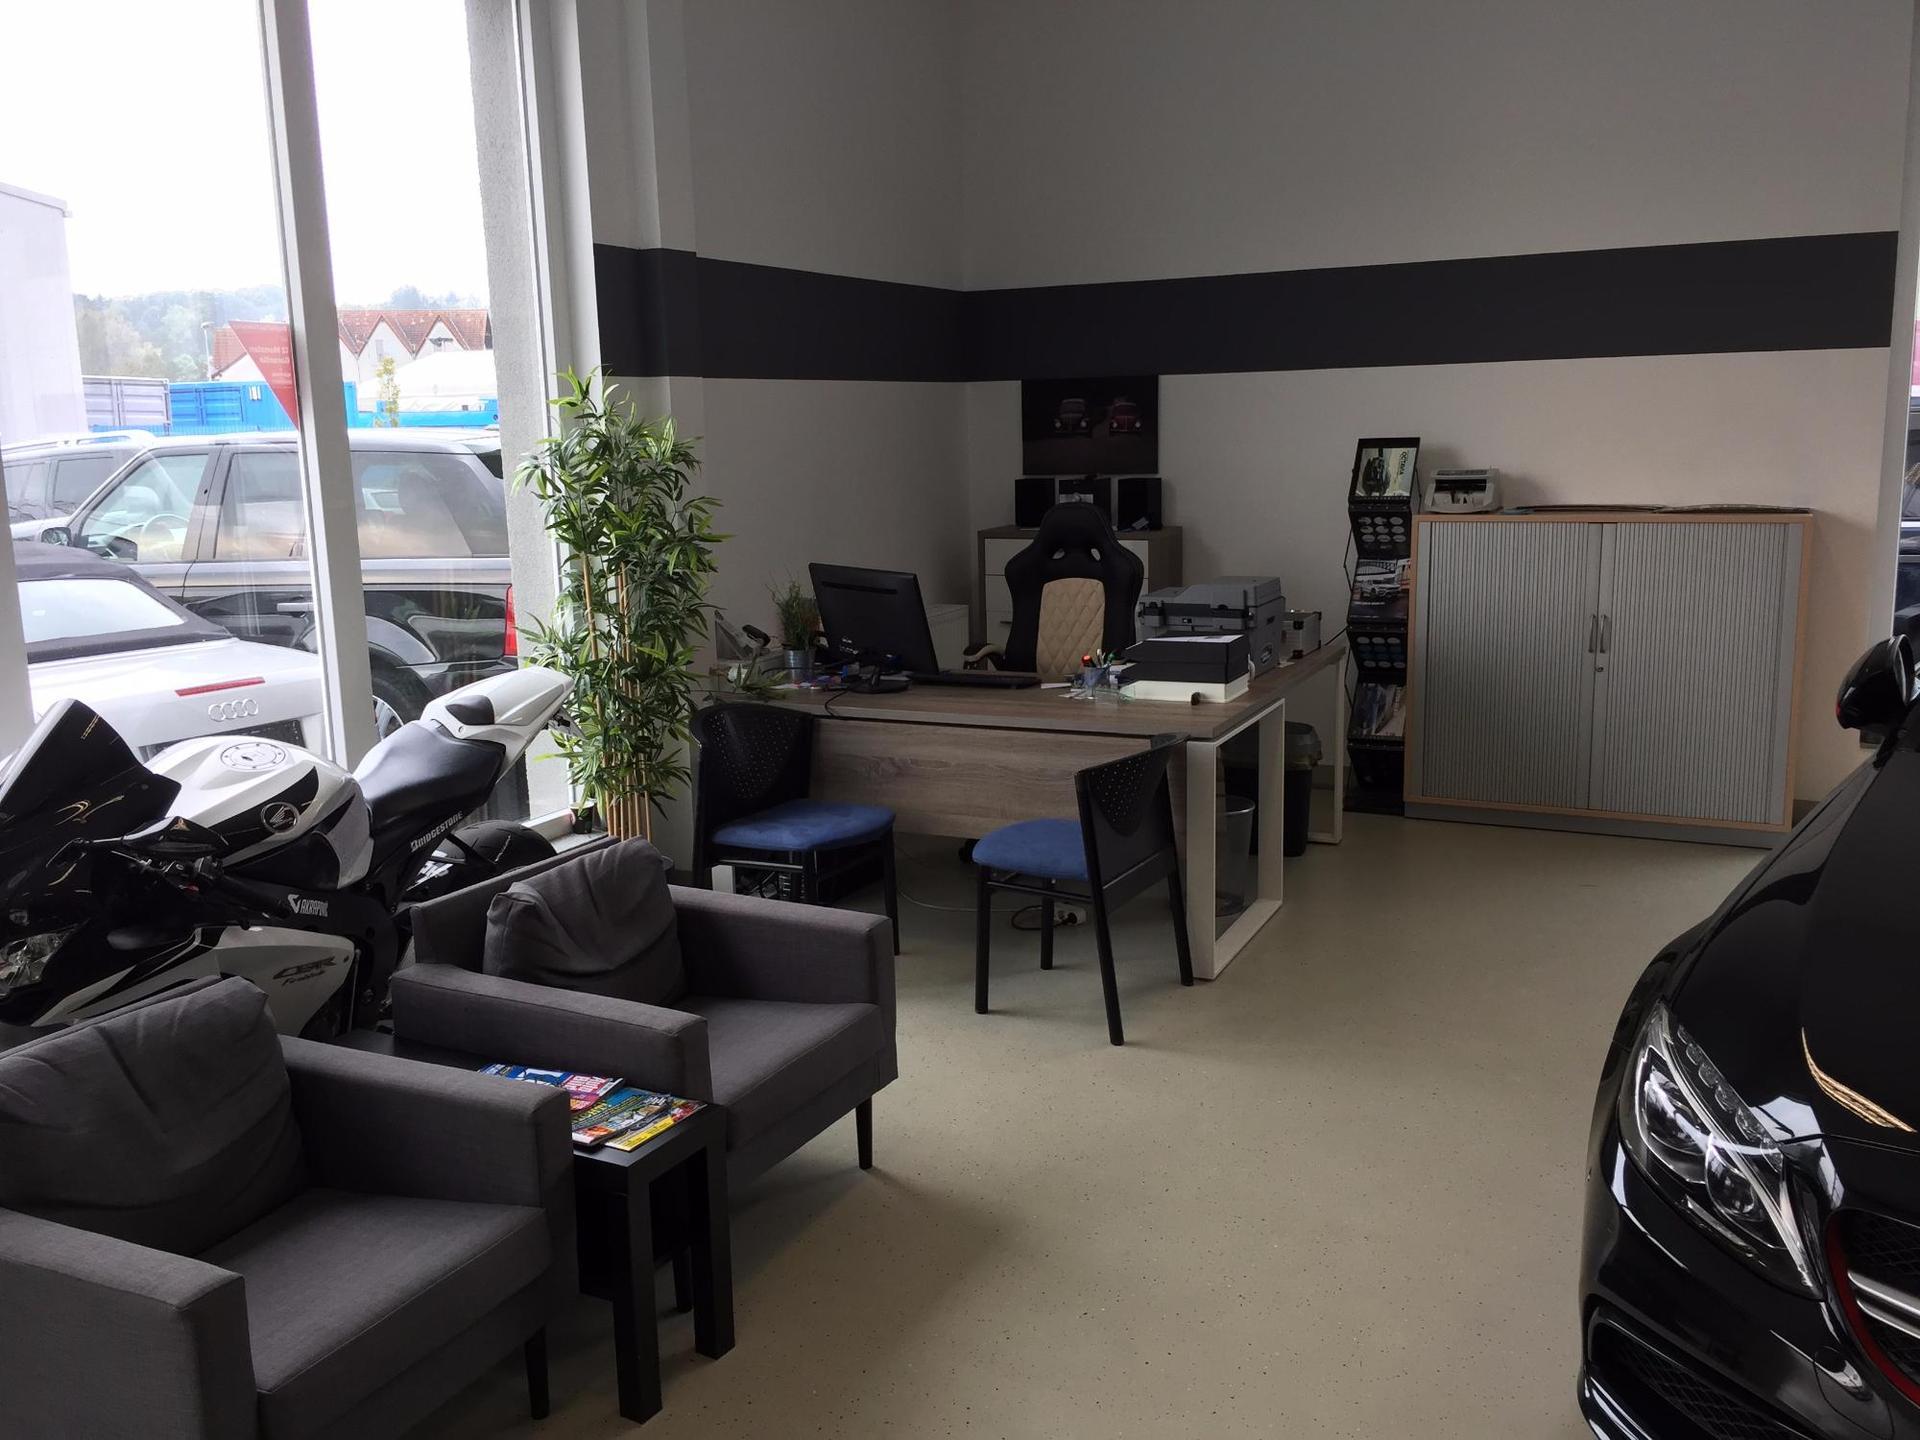 Automobile Wentland - EU Neuwagen & Gebruachte